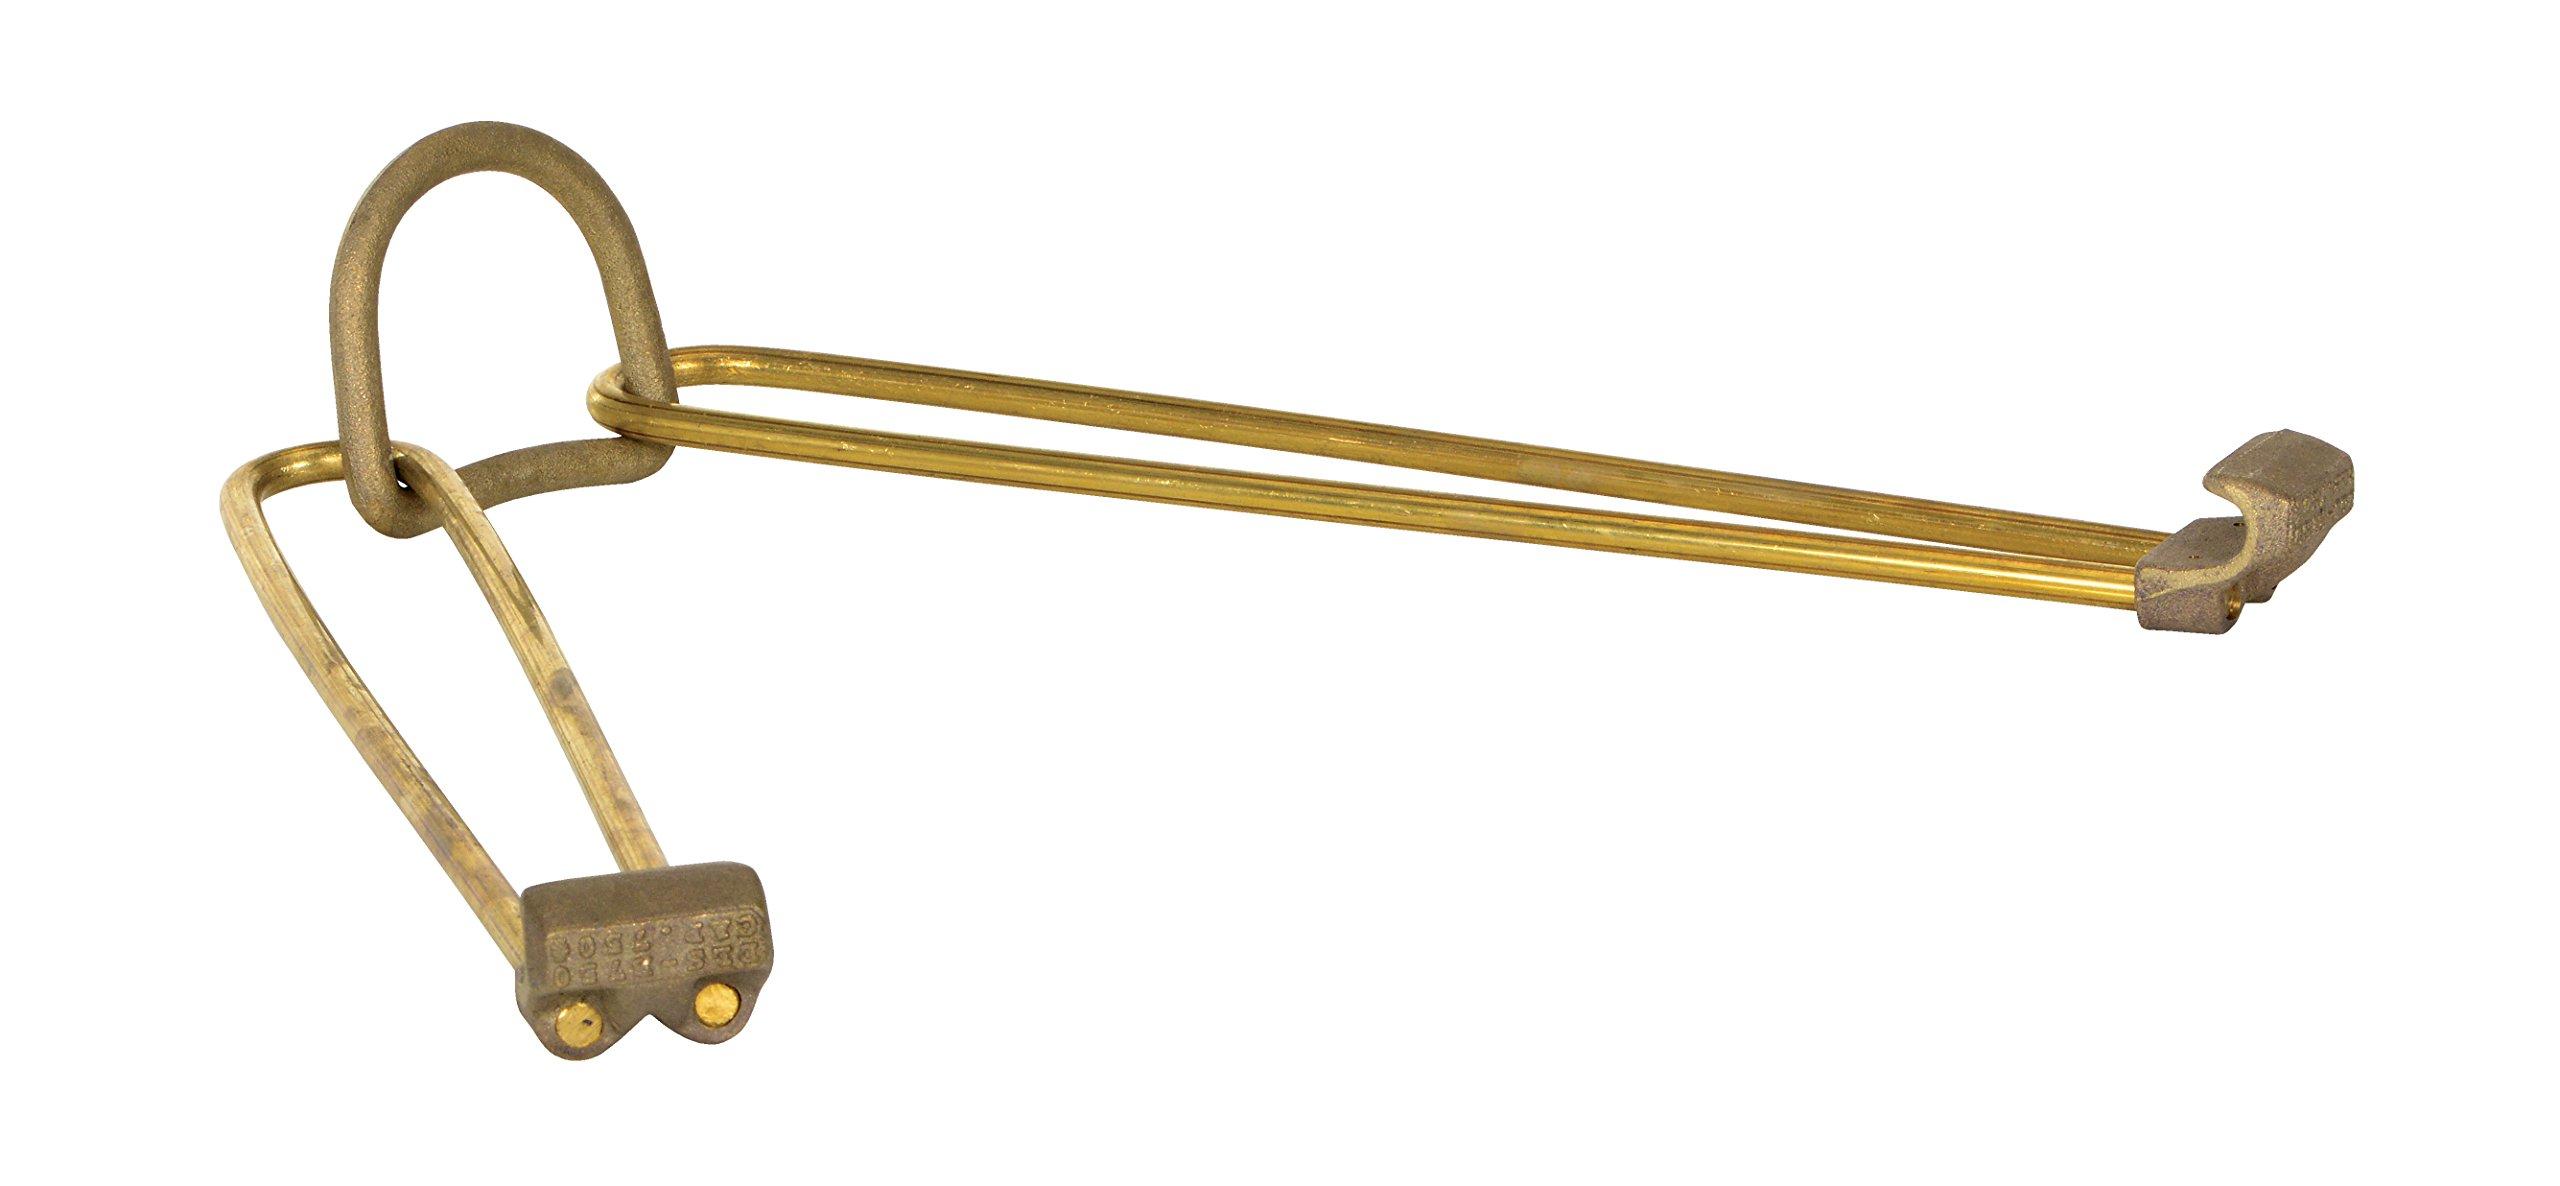 Vestil DCS-750-B Brass Drum Sling, 750 lbs Capacity